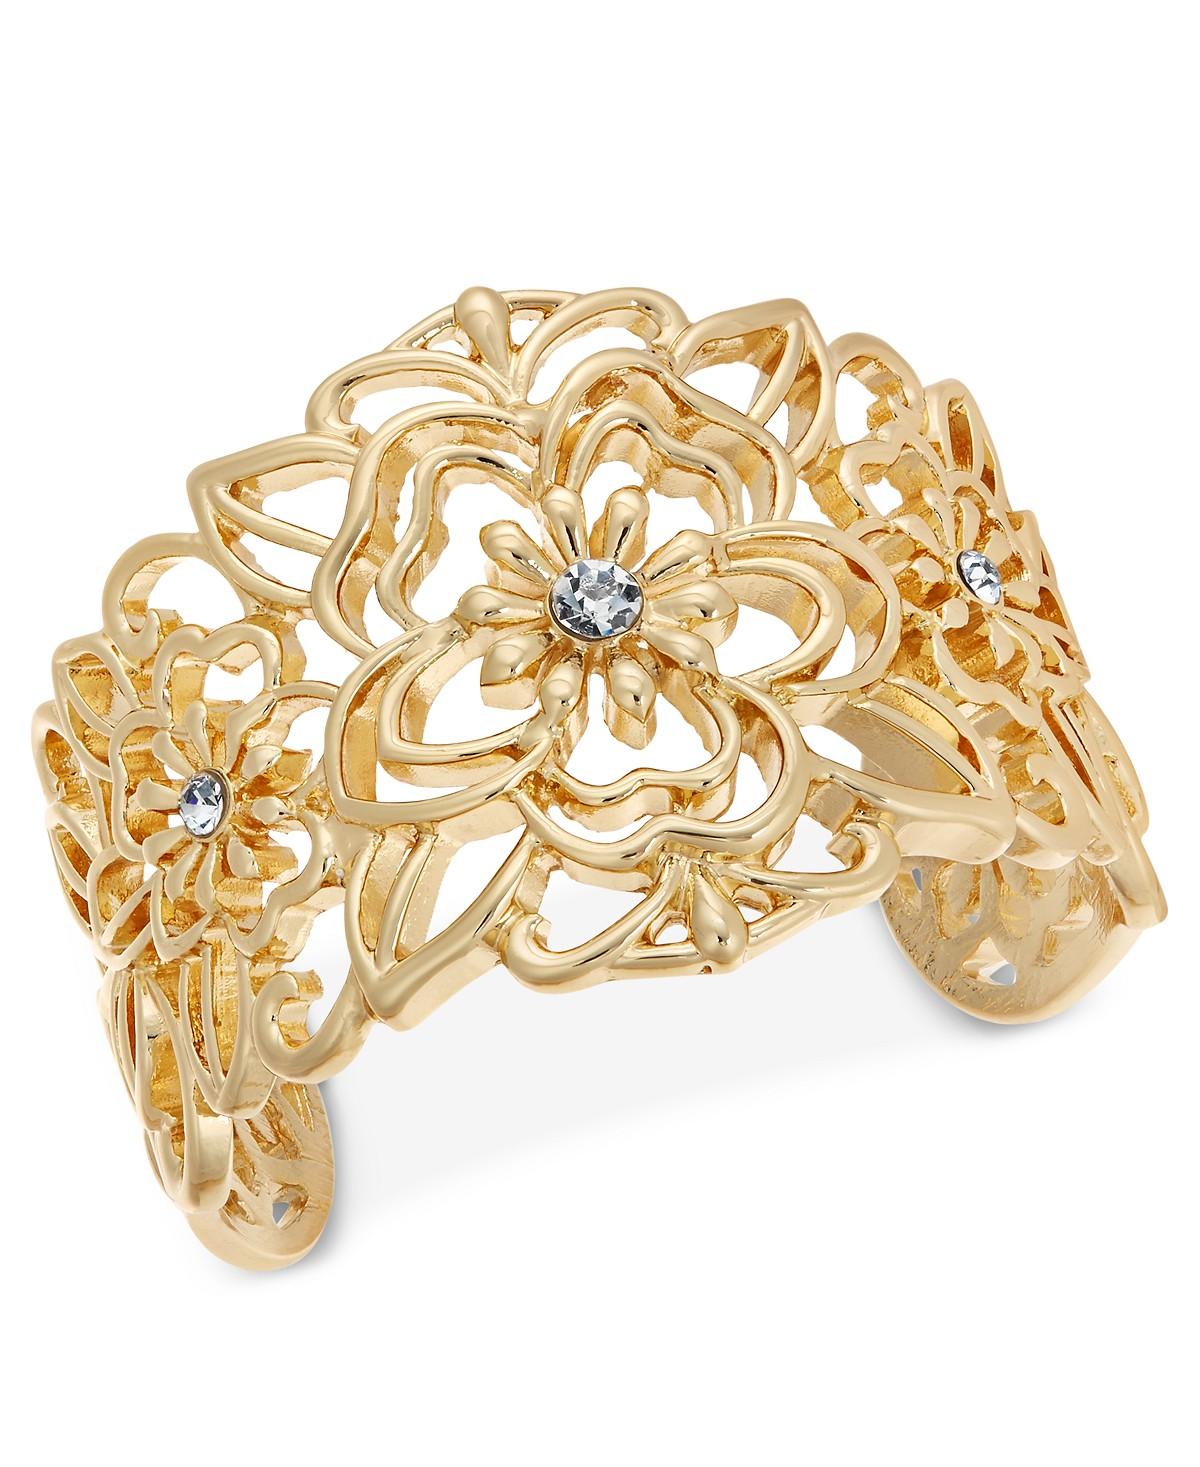 thalia-sodi-for-macys_gold-tone-crystal-flower-filigree-cuff-bracelet_34-50.jpg